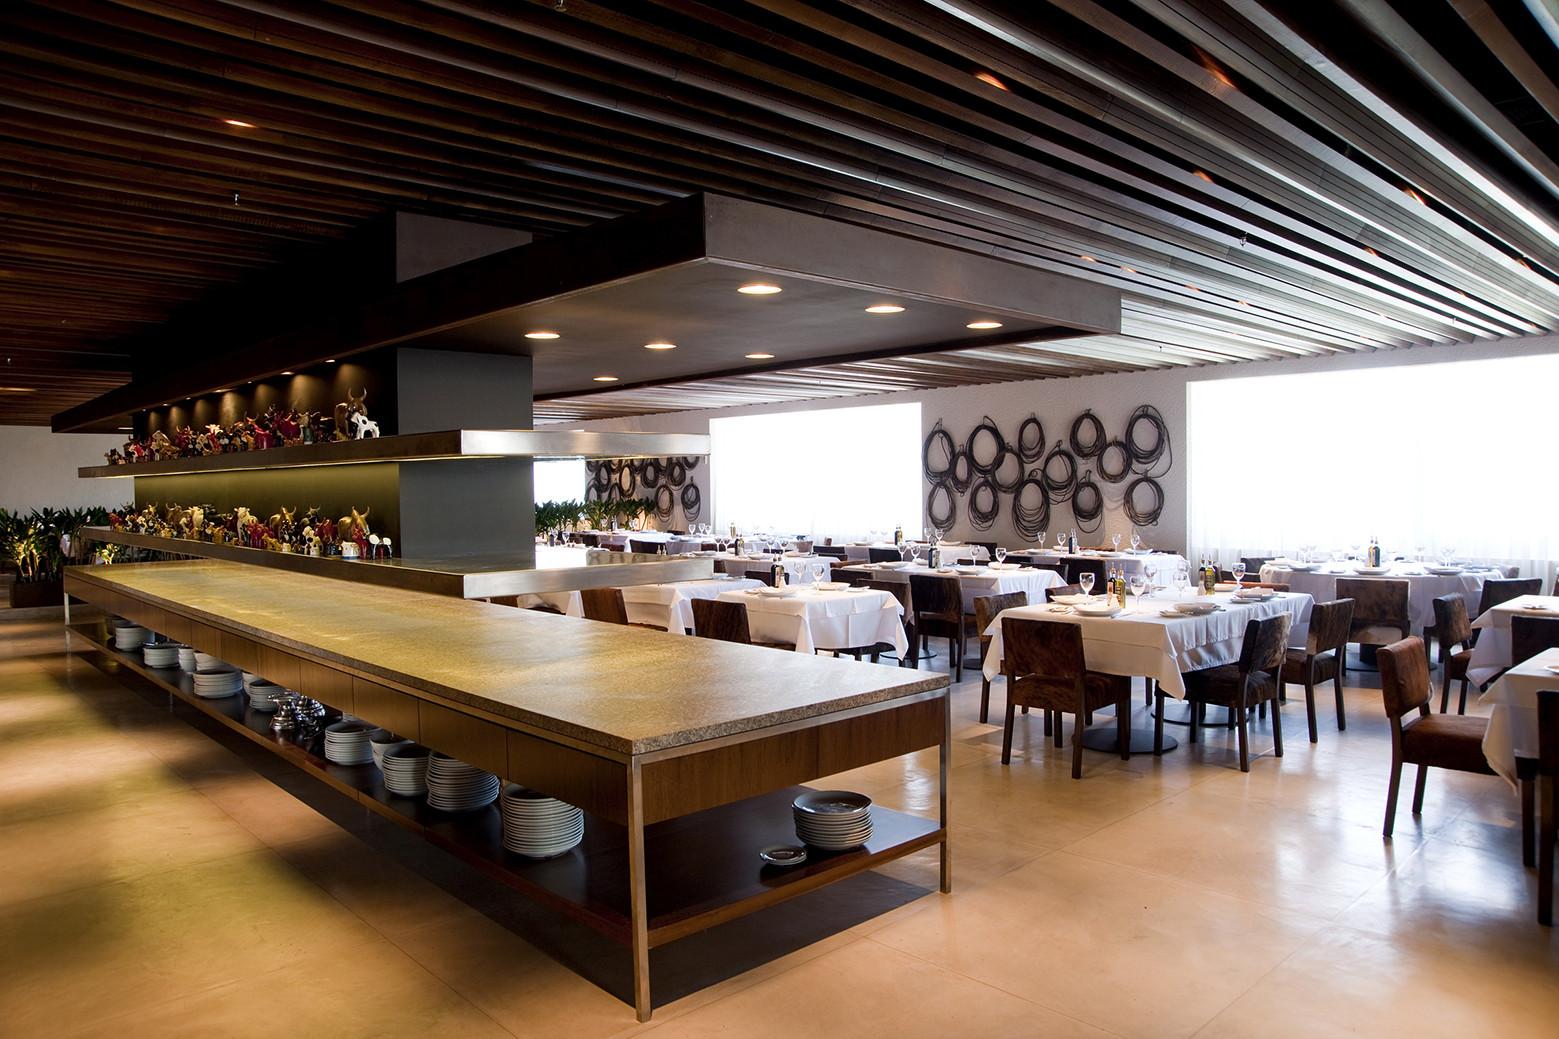 Rodeio Restaurant / Isay Weinfeld, © Romulo Fialdini